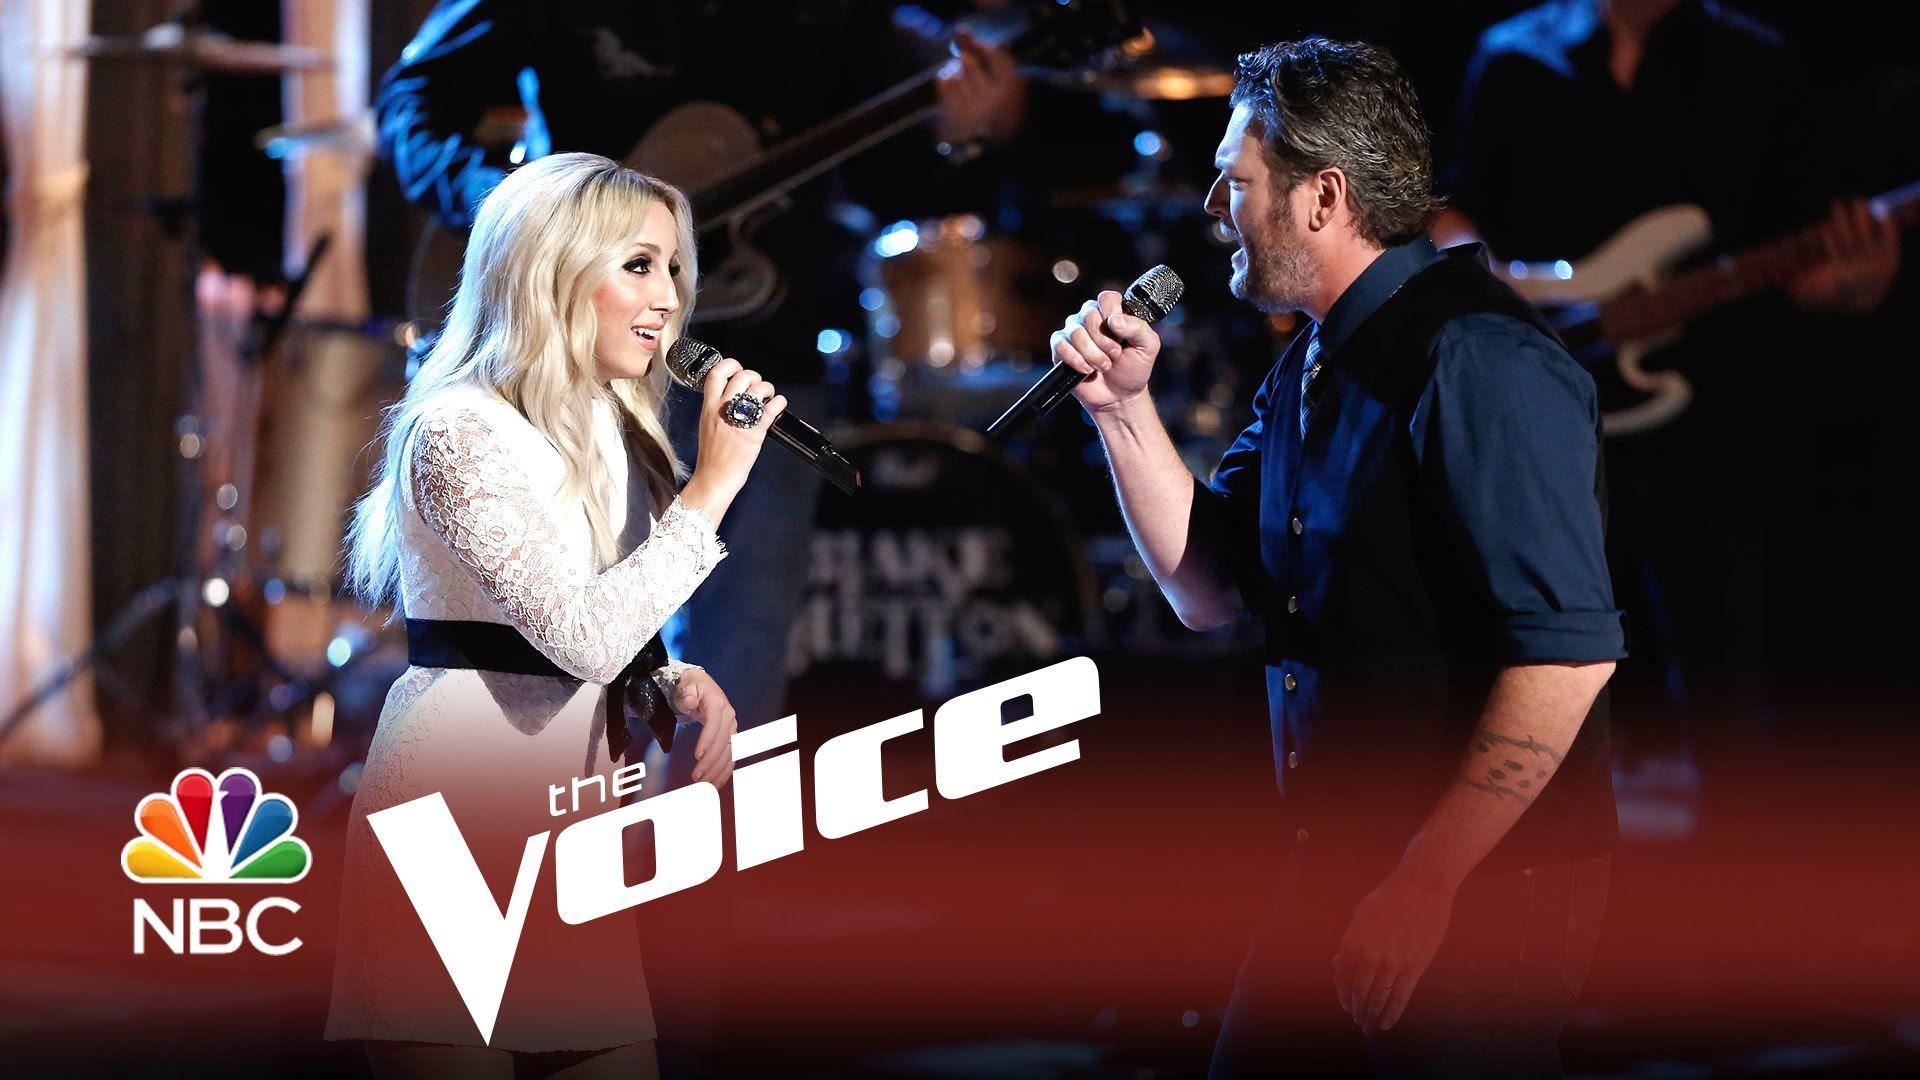 Blake Shelton : The Voice (12/5) photo maxresdefault-2.jpg